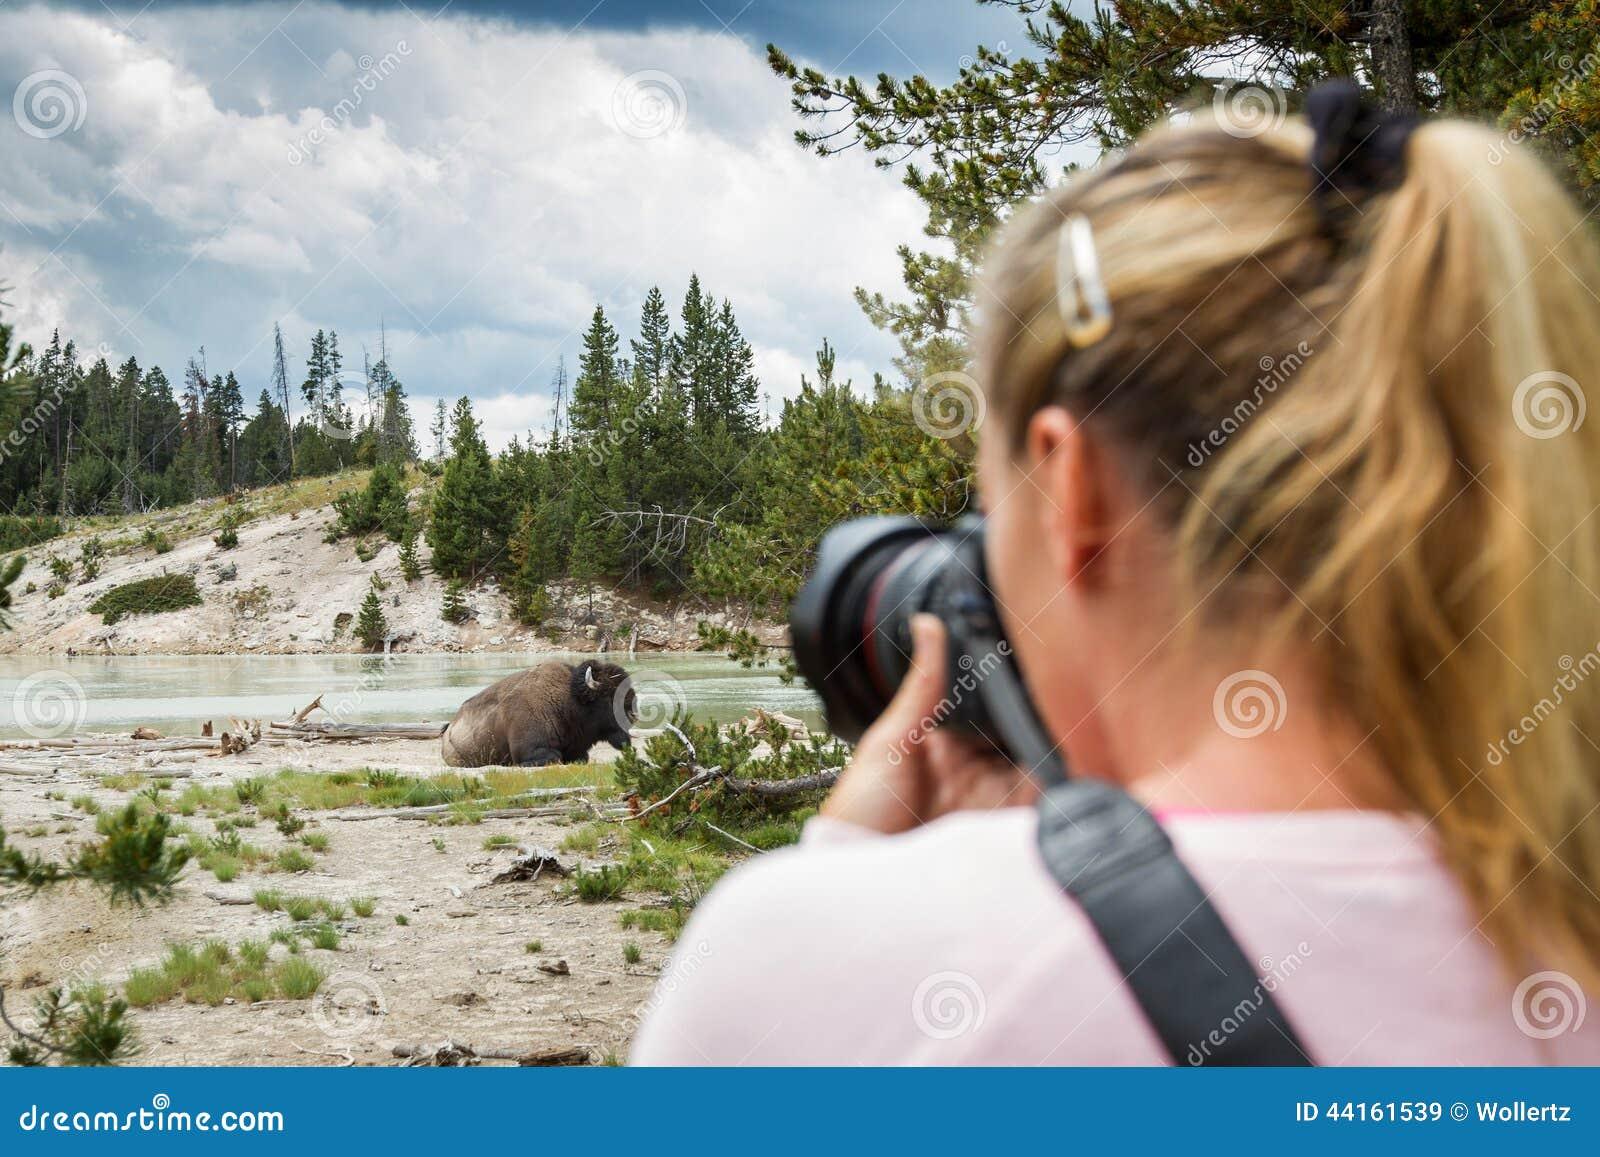 Wildlife photographer in yellowstone